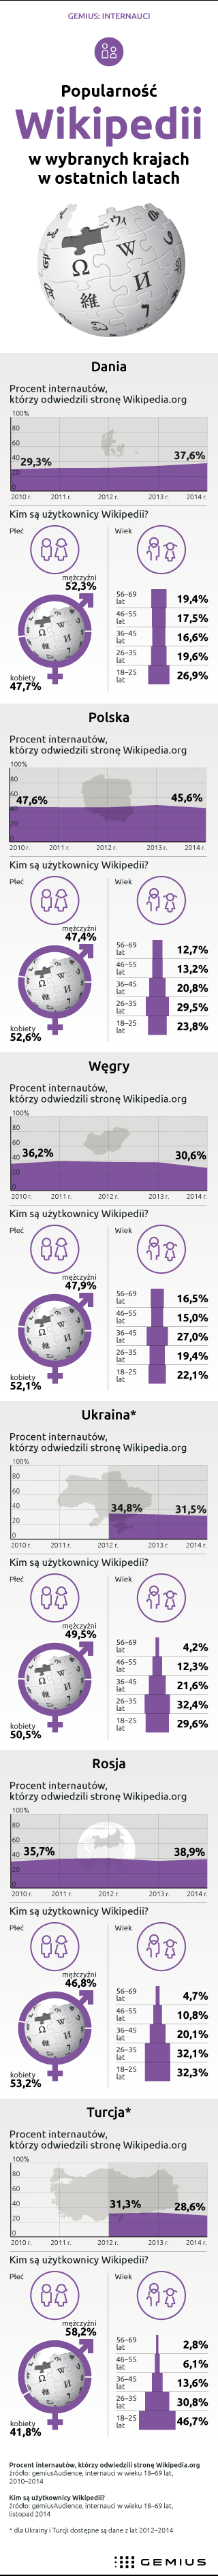 2015_03_23_Wikipedia_Dluga